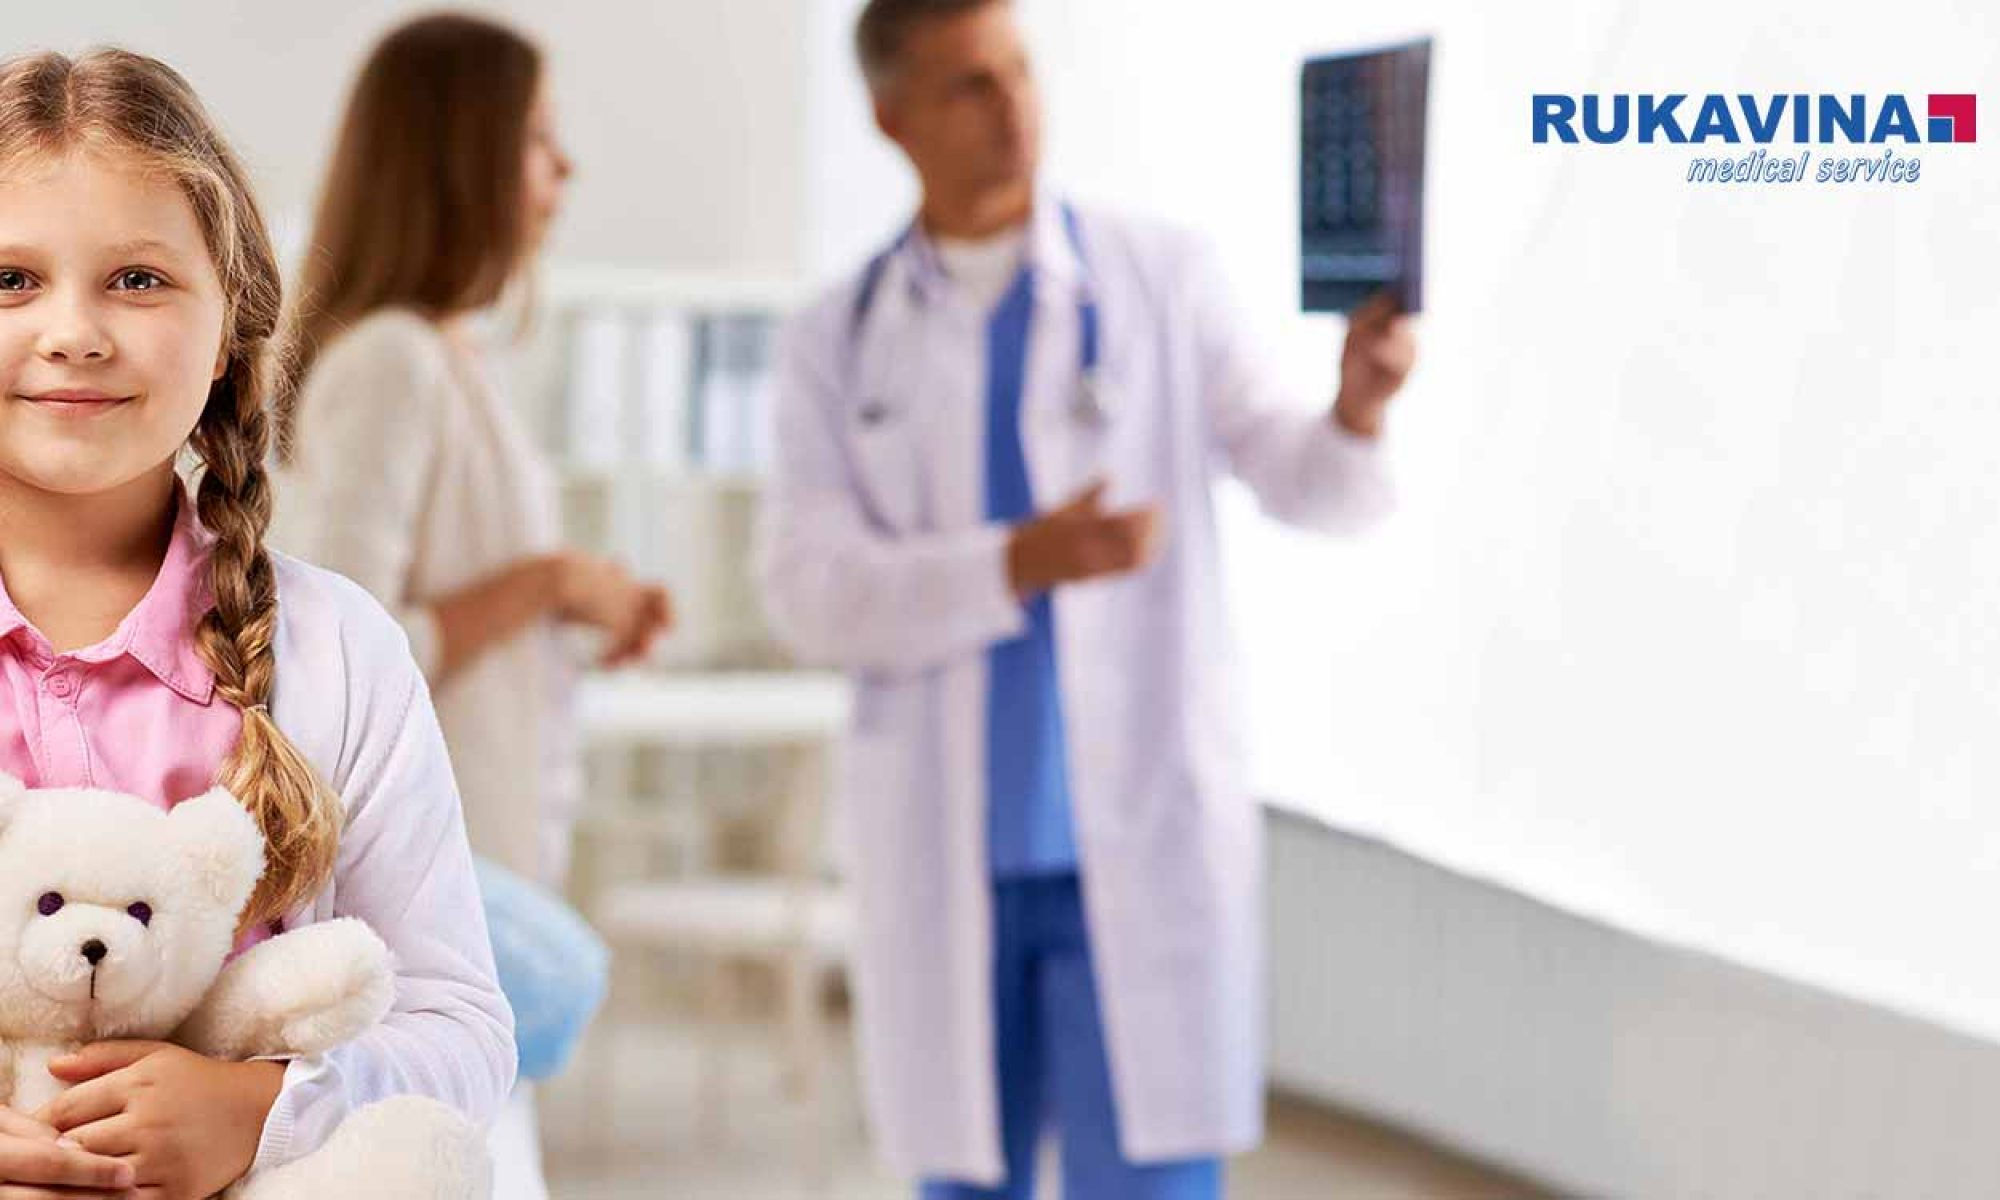 RUKAVINA Medical Service GbR